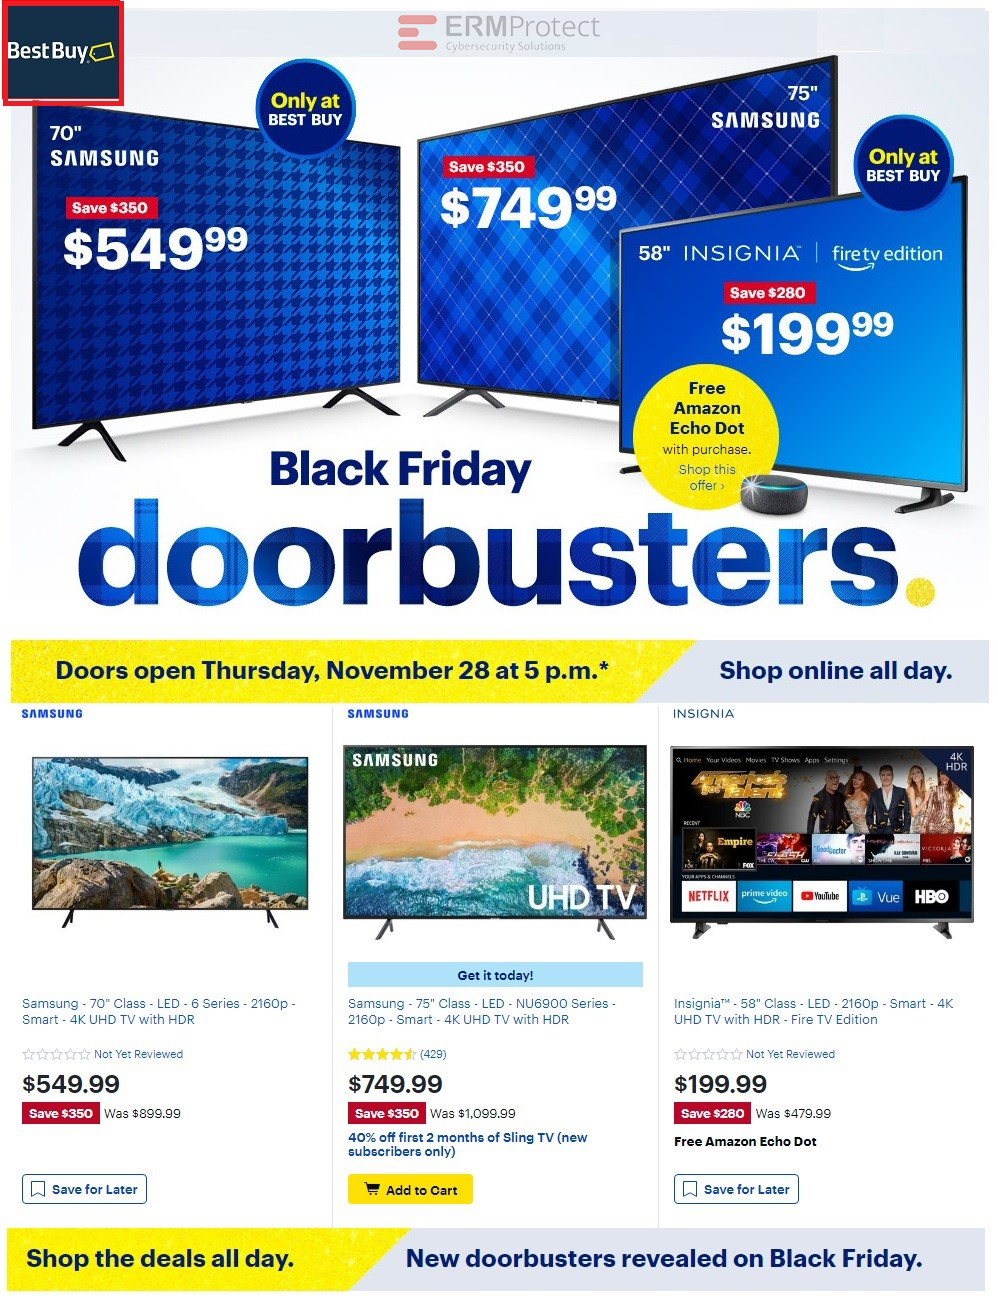 Best Buy Black Friday Phishing Scam Red Flags 4